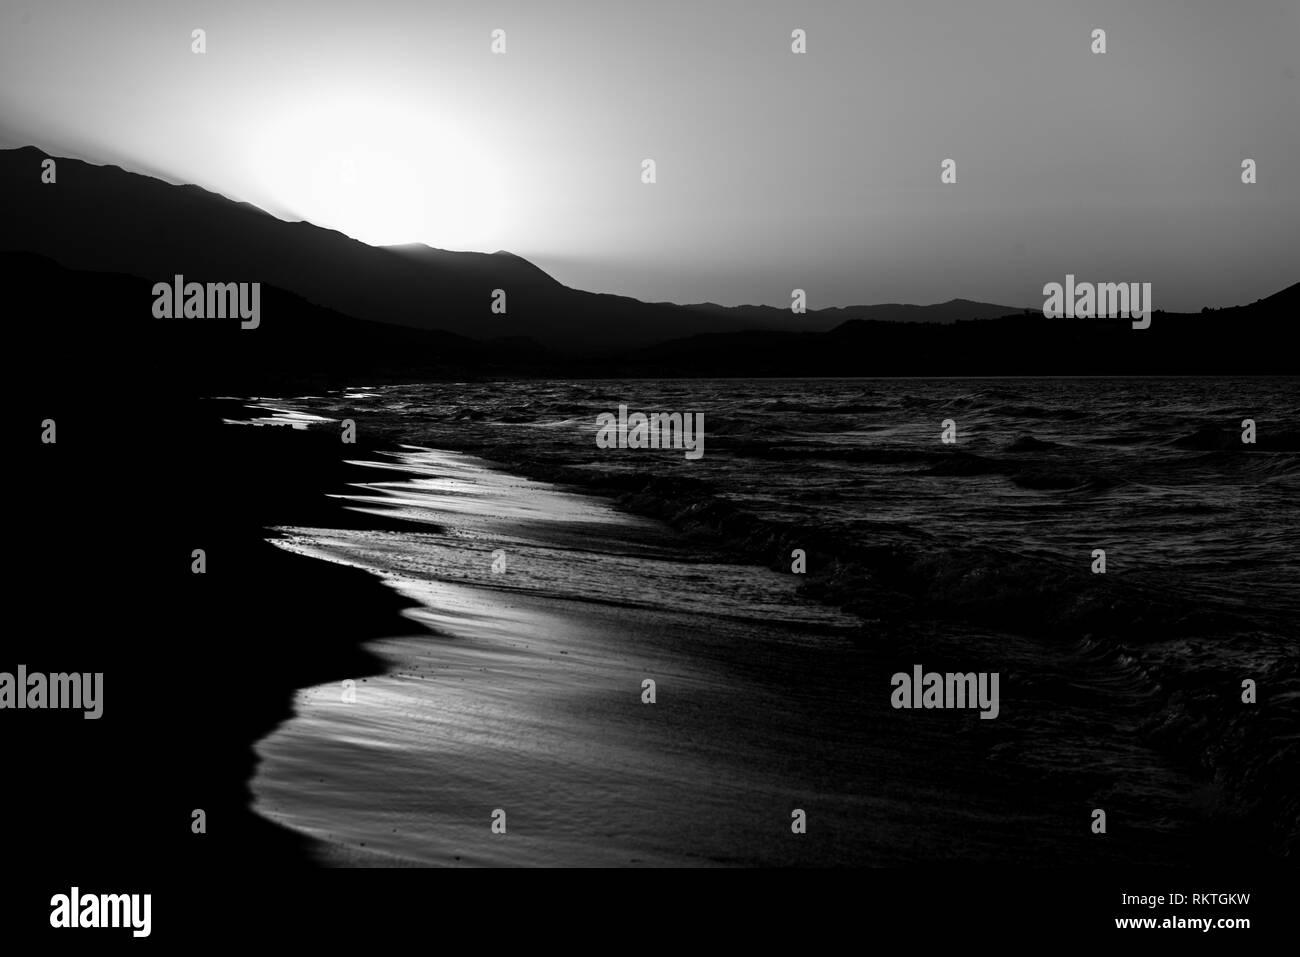 Beach at sunset - Stock Image